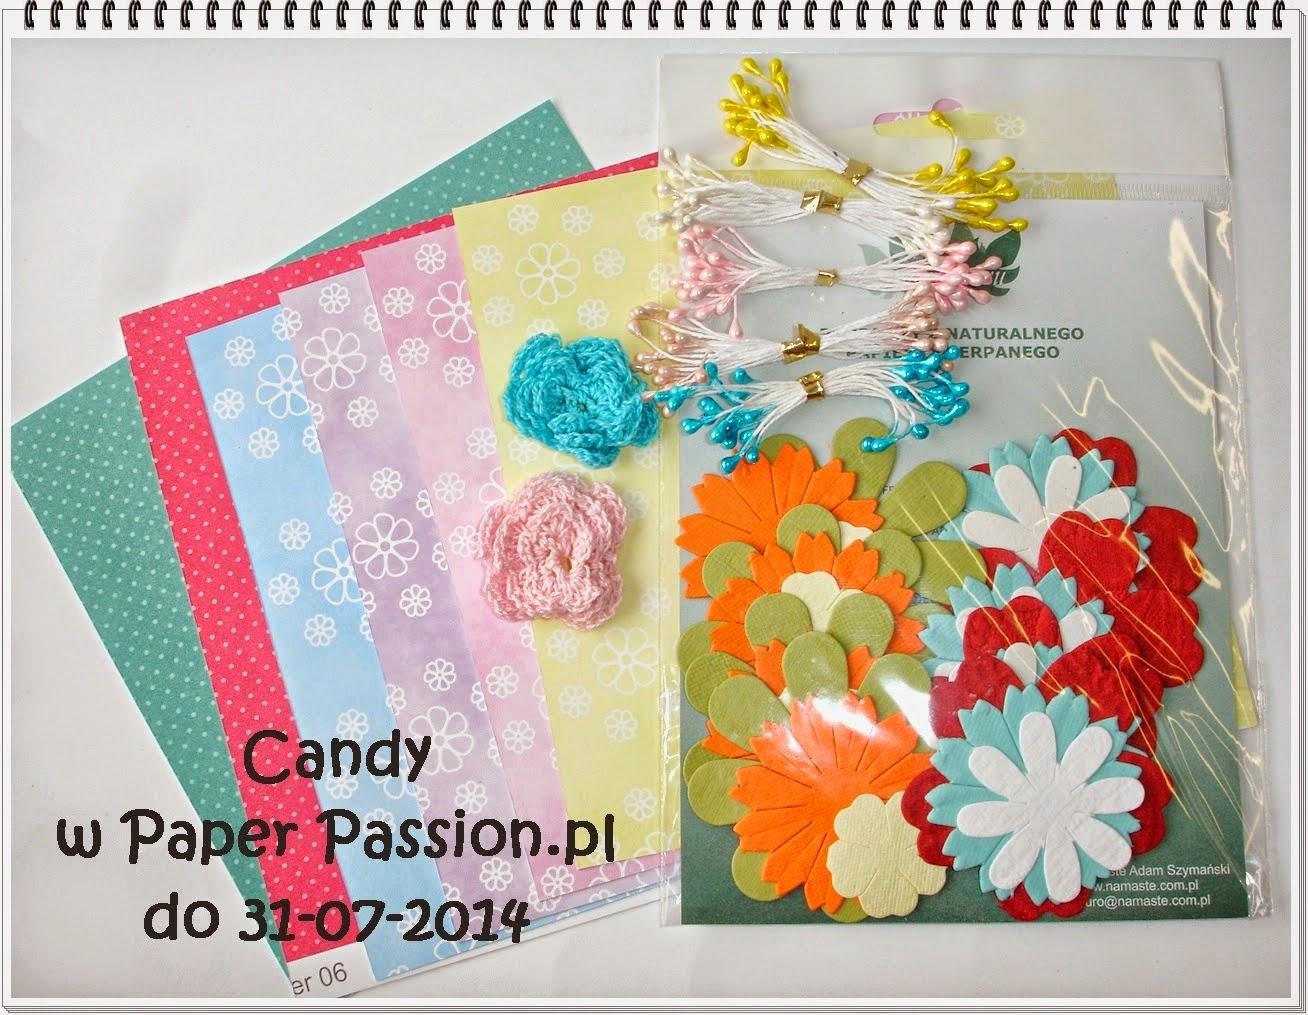 http://paperpassionpl.blogspot.de/2014/07/lipcowe-candy.html